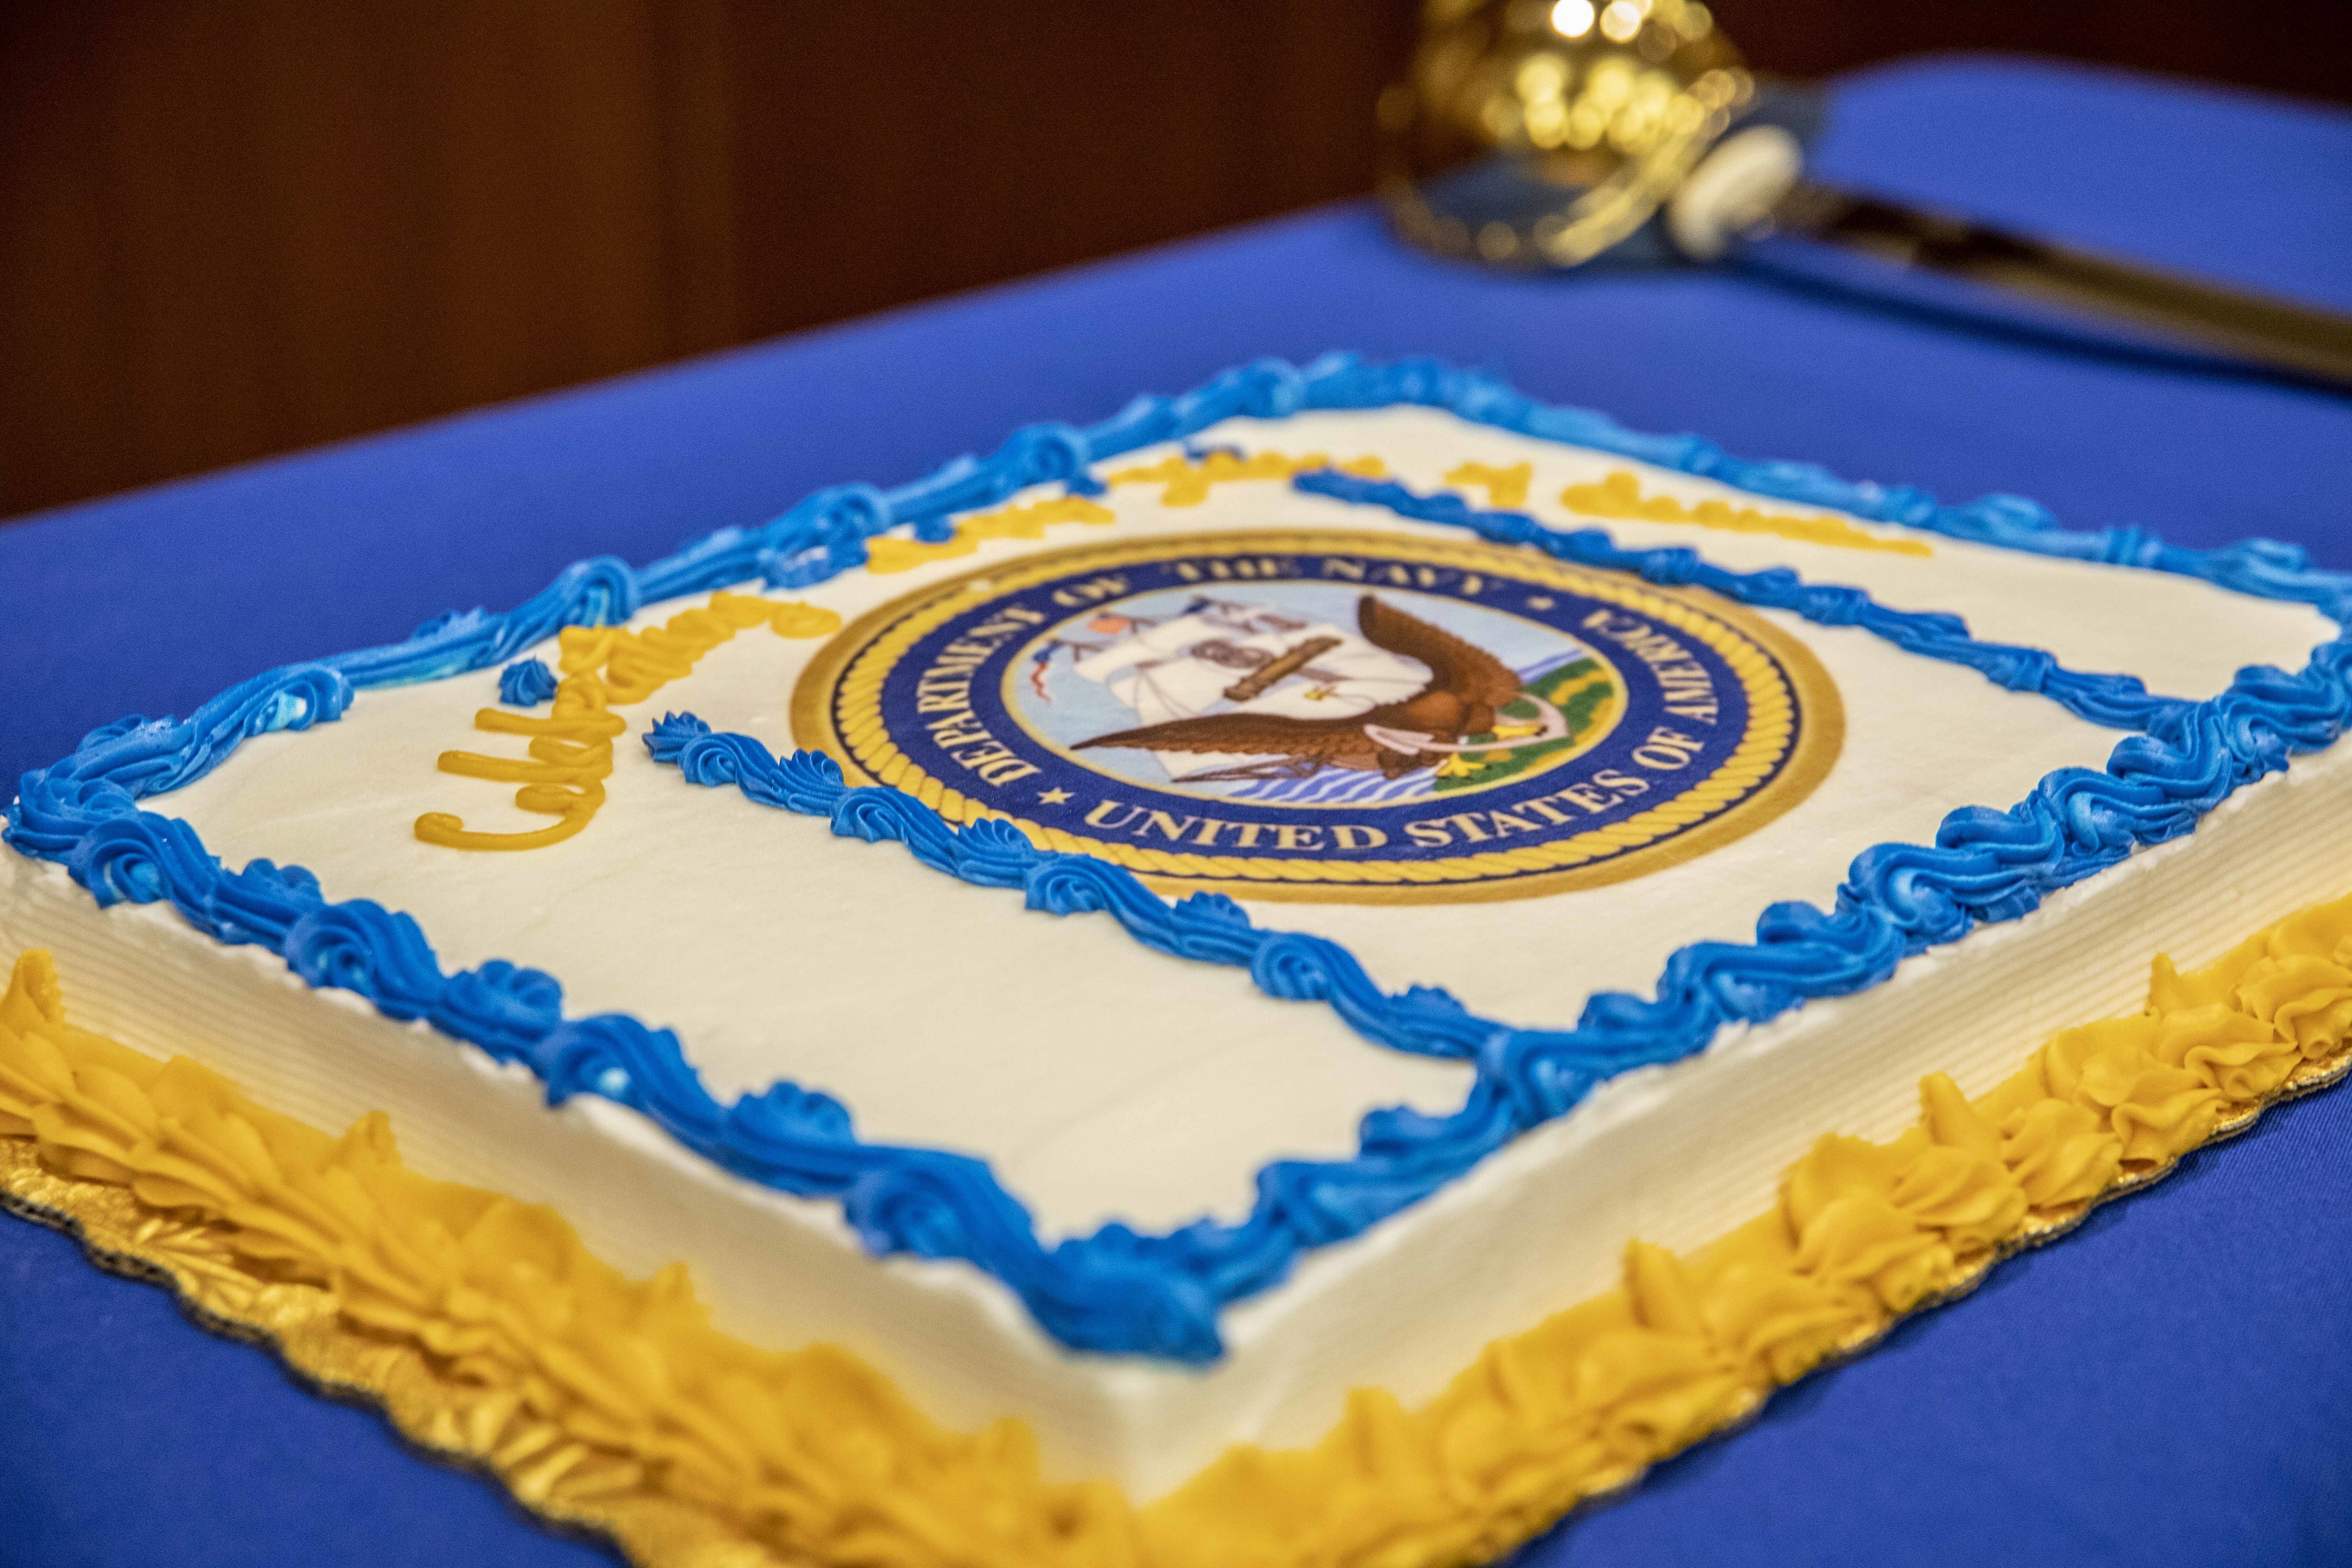 Awesome Marforres Celebrates 244Th U S Navy Birthday Funny Birthday Cards Online Fluifree Goldxyz